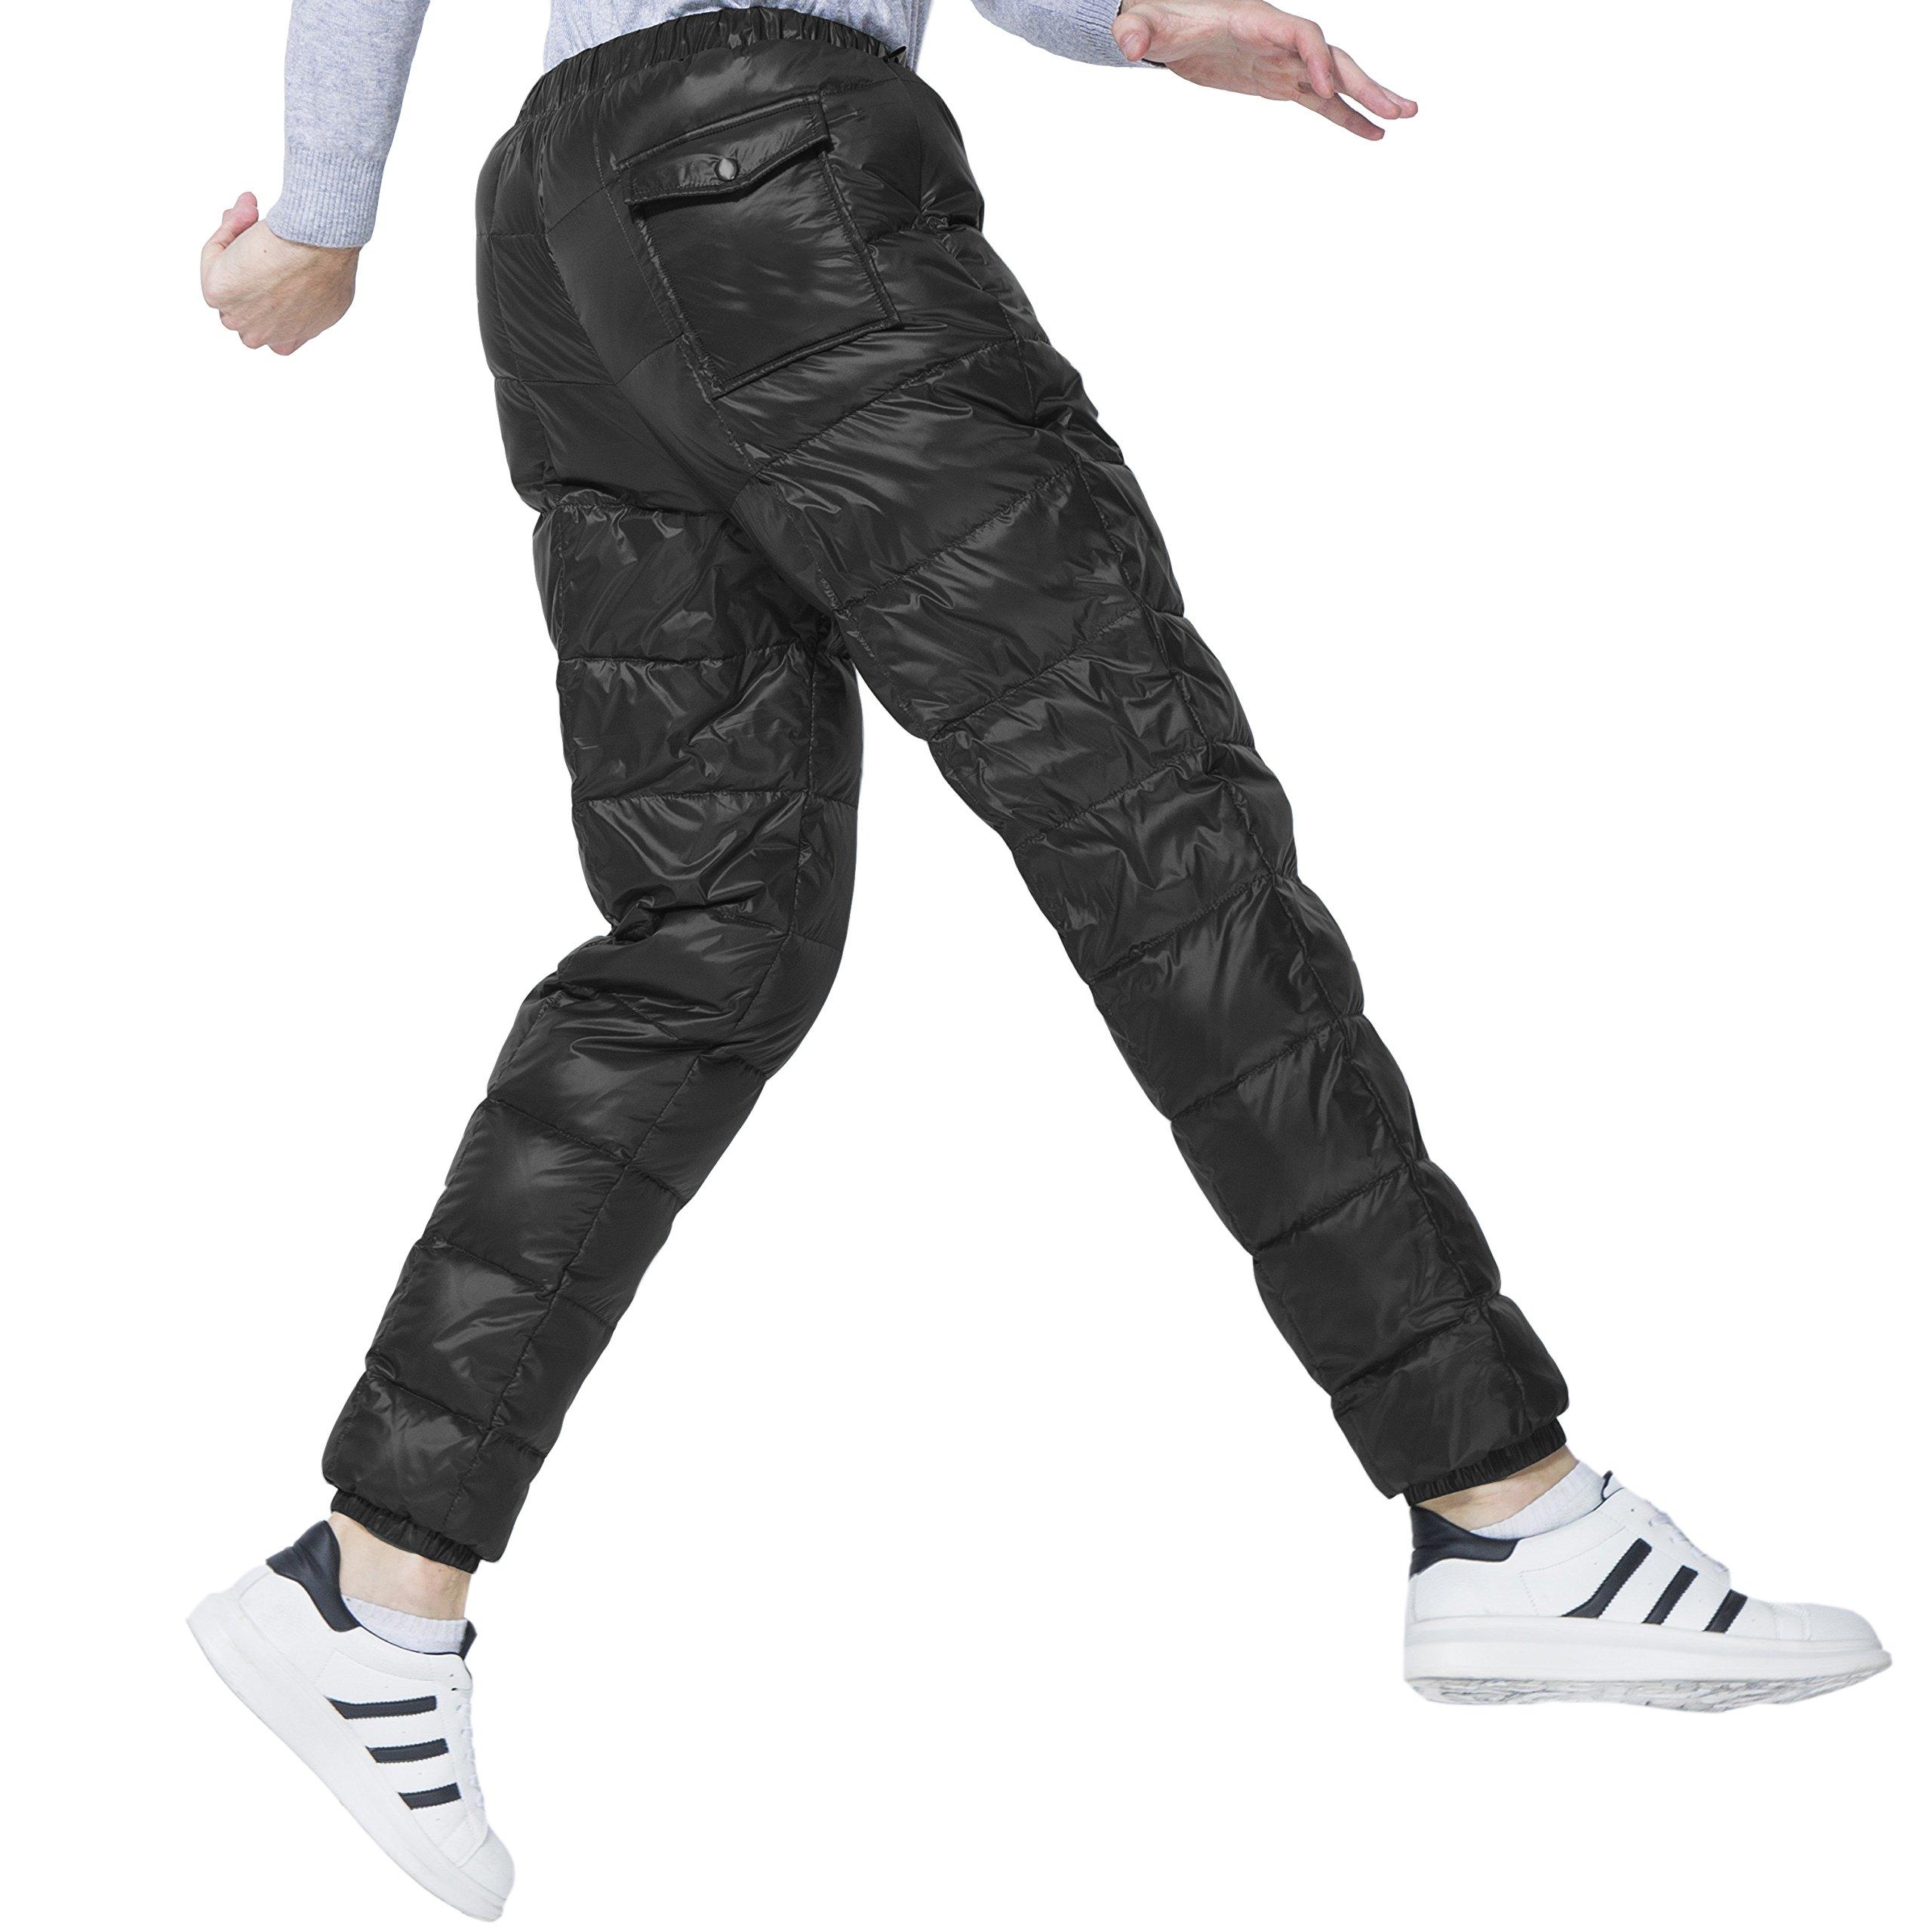 QIYU PANLTCY Men's Packable Down Puffer Pants Winter Warm Lightweight Snow Trousers (Medium, Black)